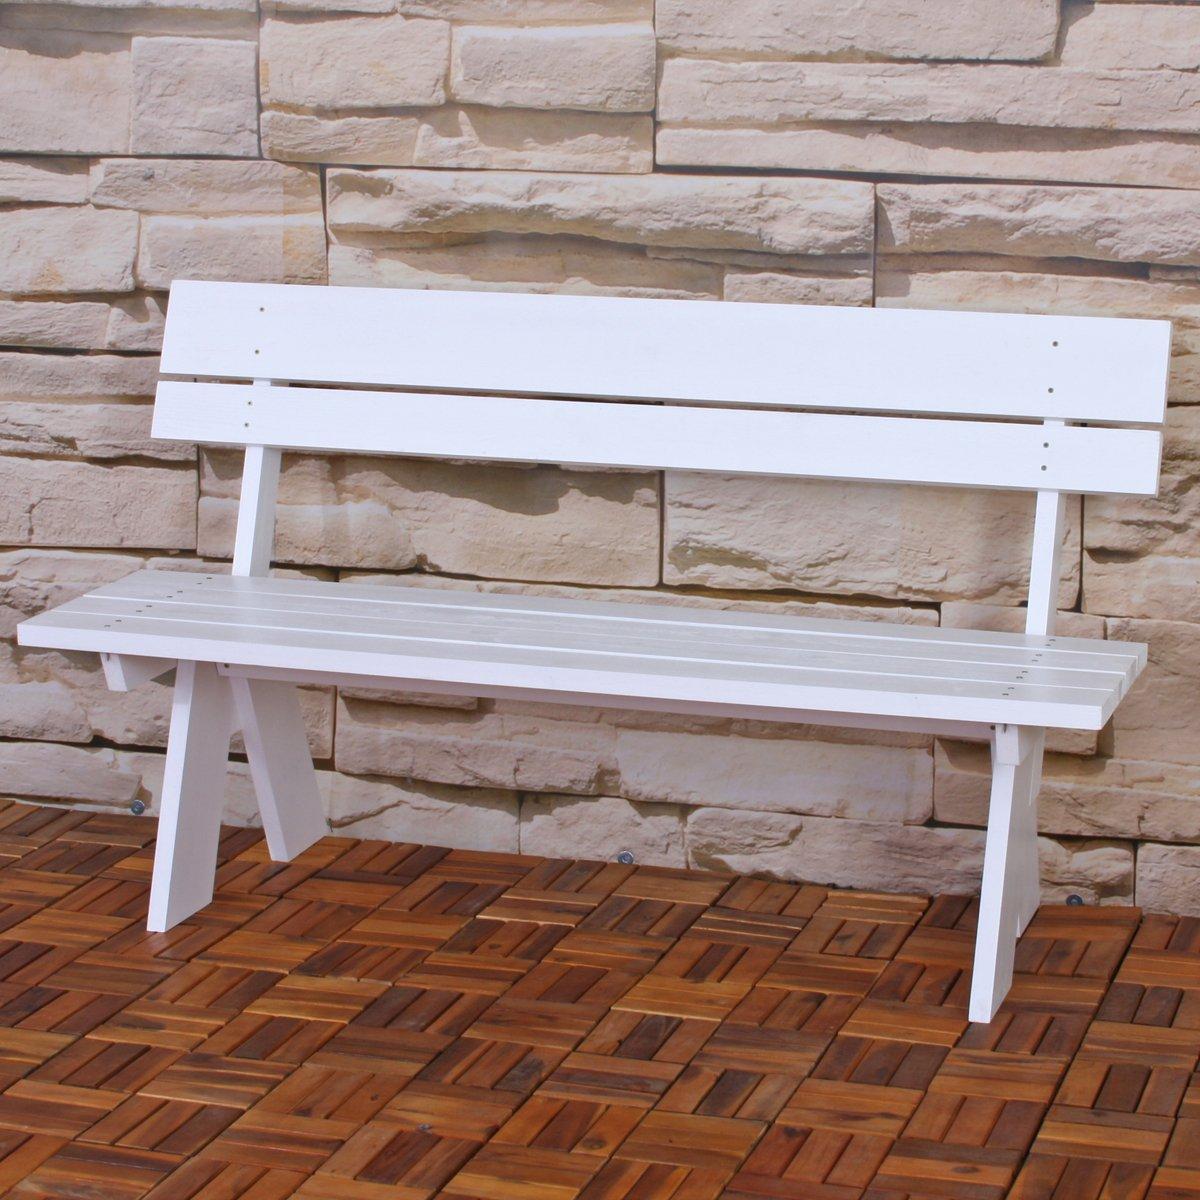 Banco de madera maciza para jard n oslo color blanco for Banco madera jardin